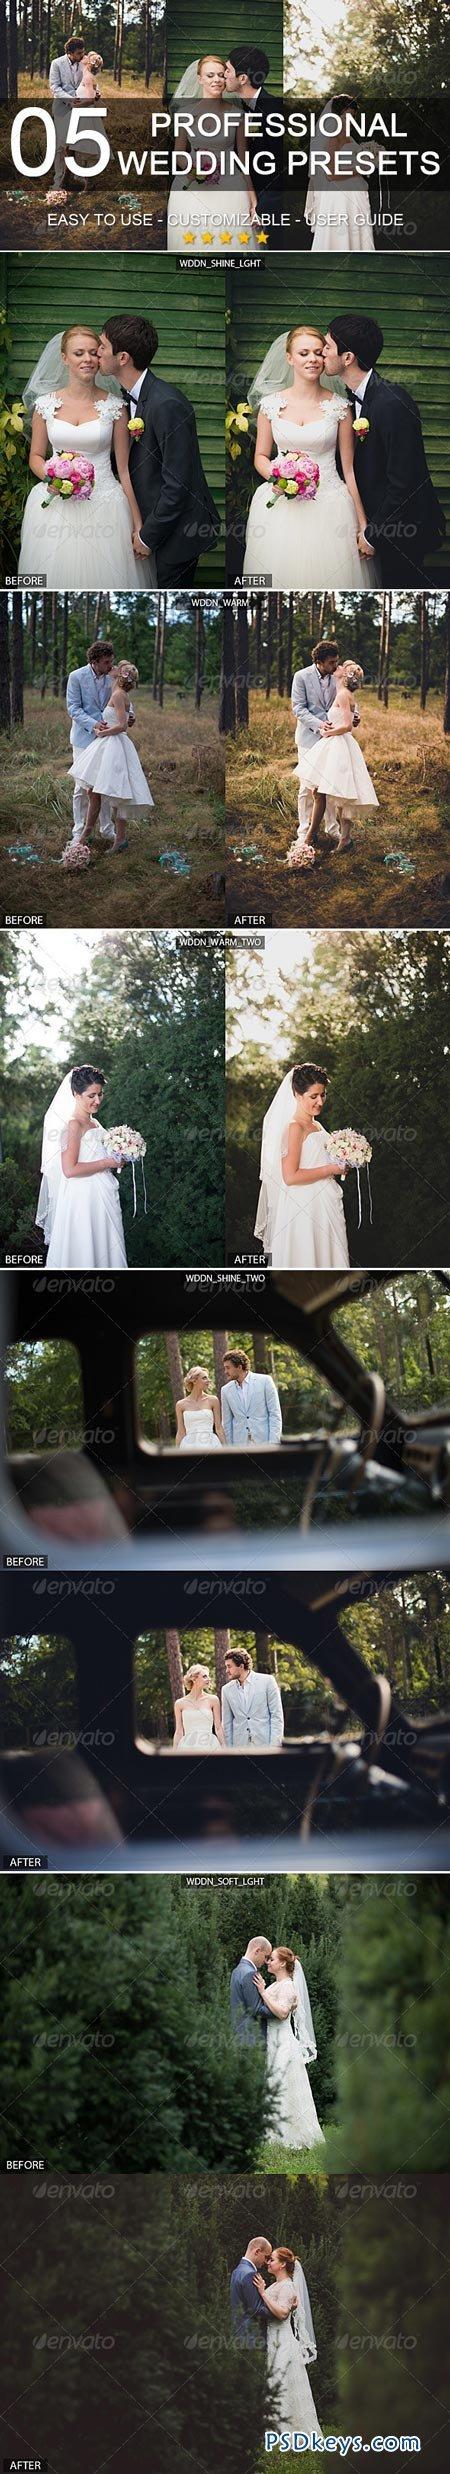 5 professional wedding presets 6124926